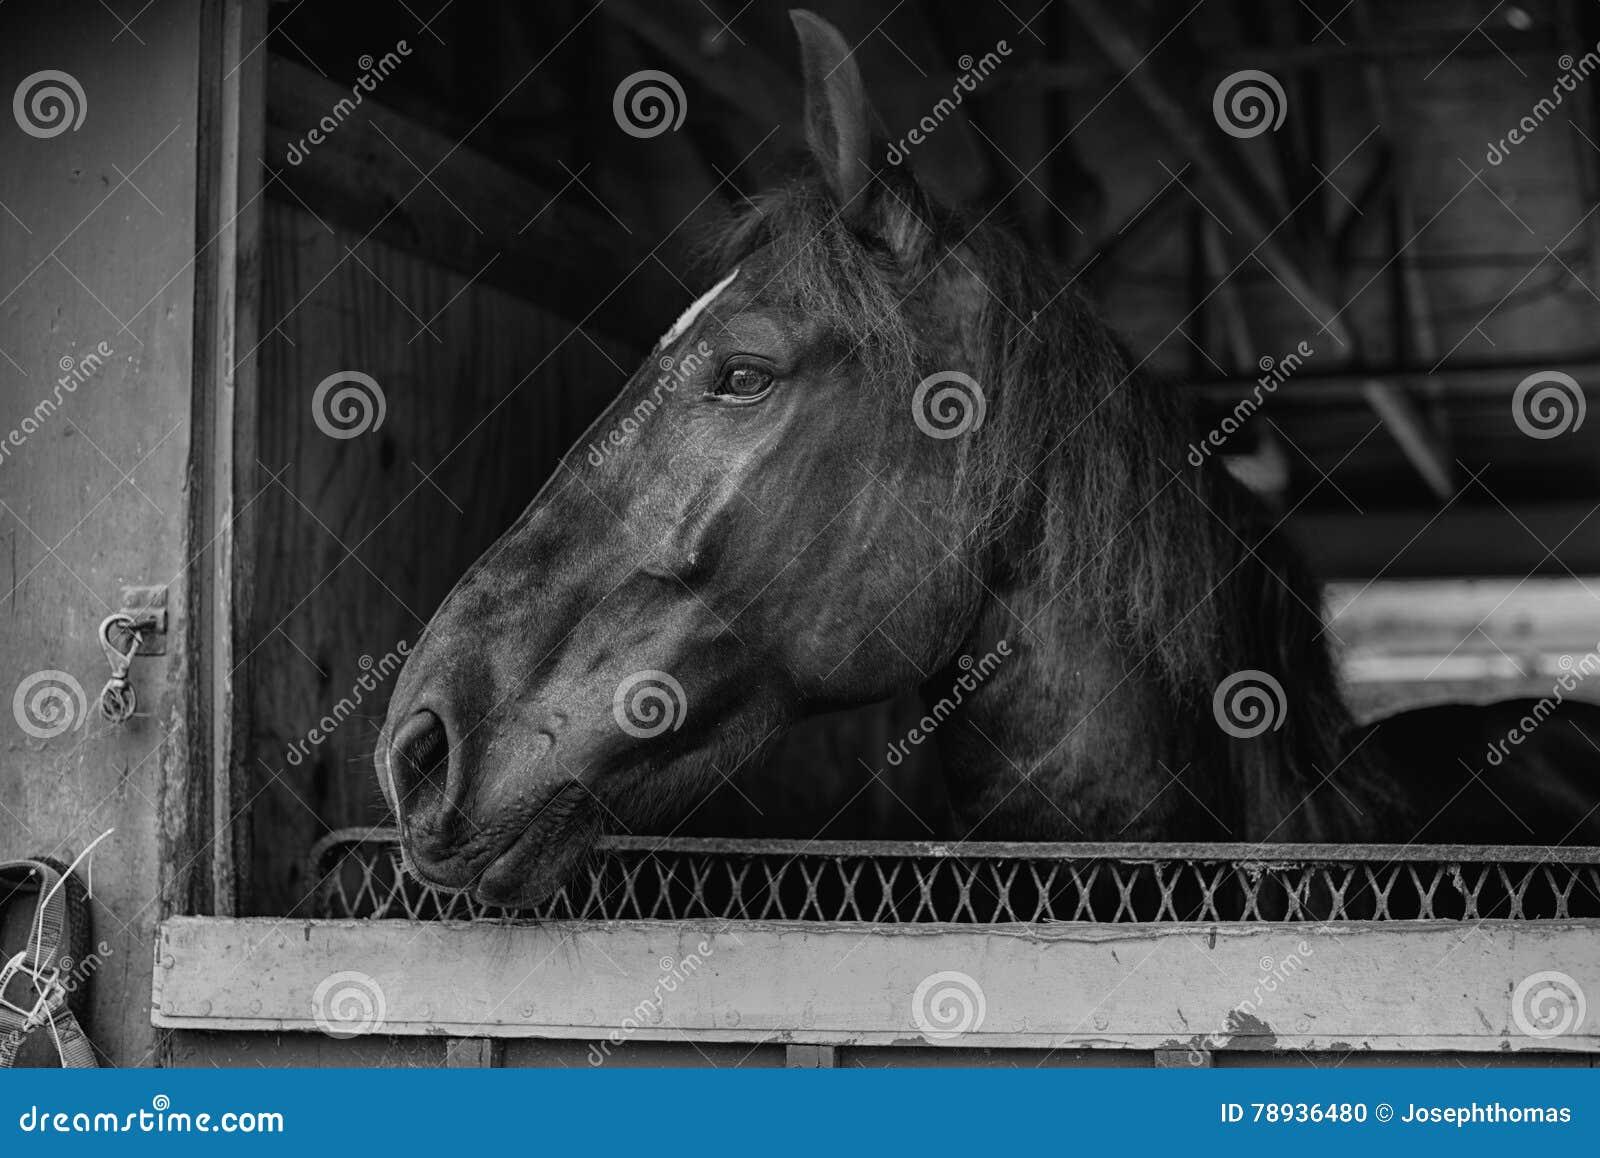 Black horse face close up - photo#48